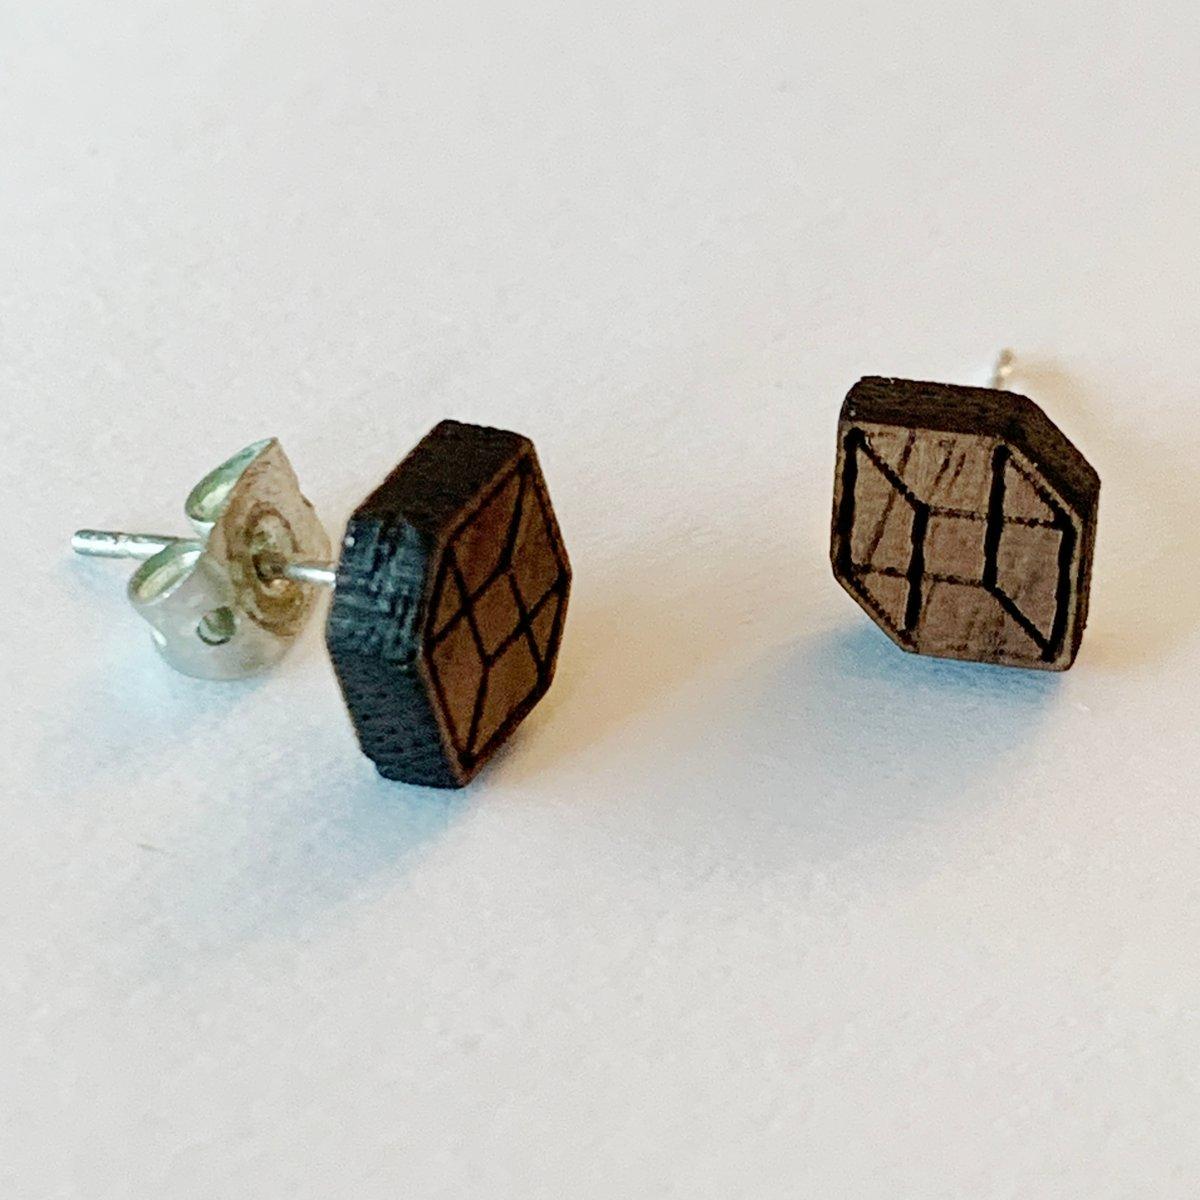 Image of Trompe L'oeil Cube Studs